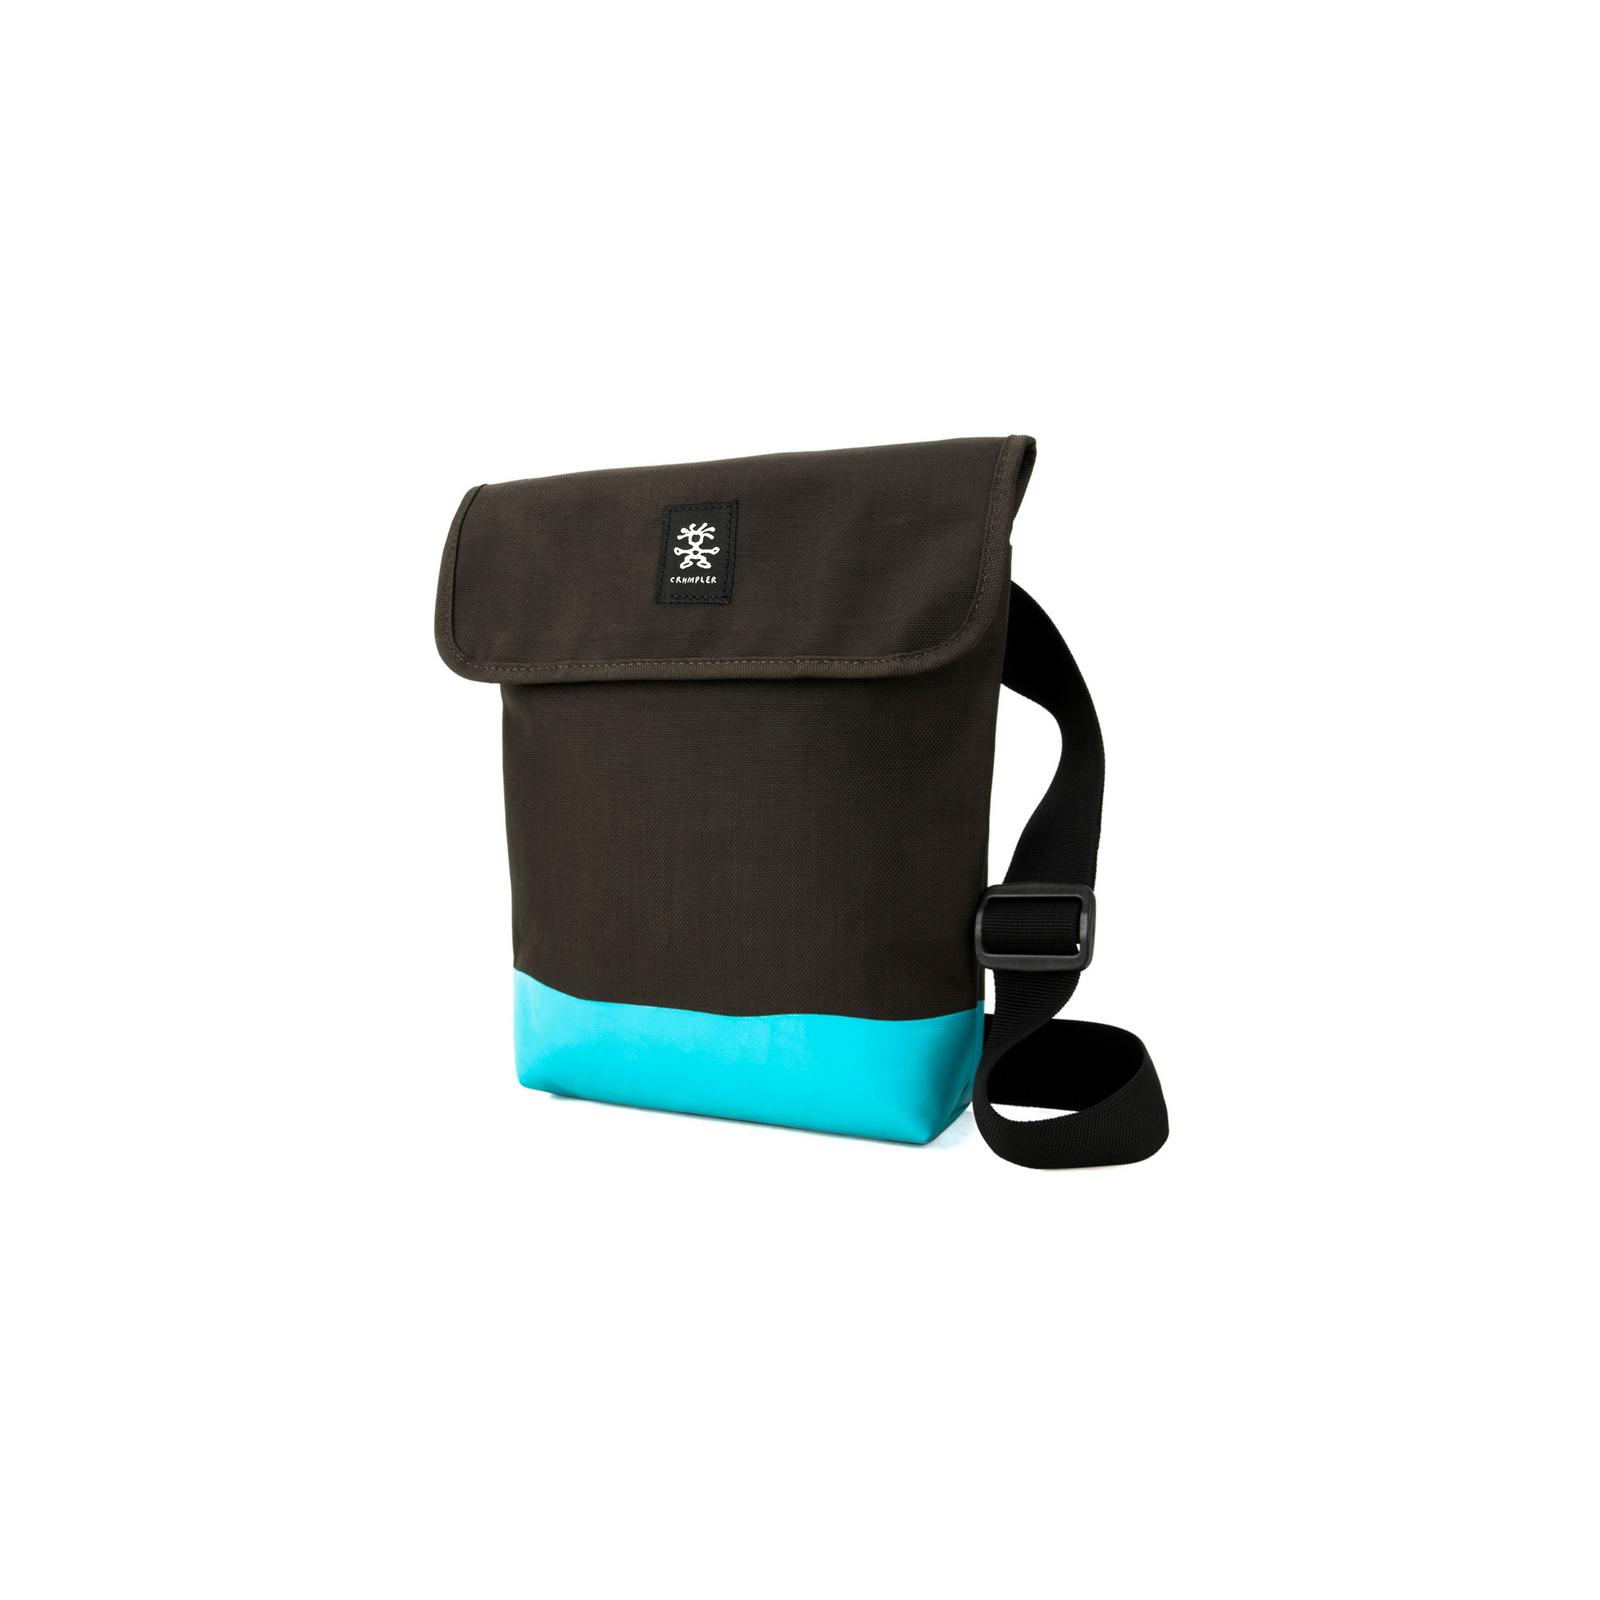 Чехол для планшета Crumpler 9 Private Surprise Sling S /espresso - turquoise (PSS-S-011) изображение 2